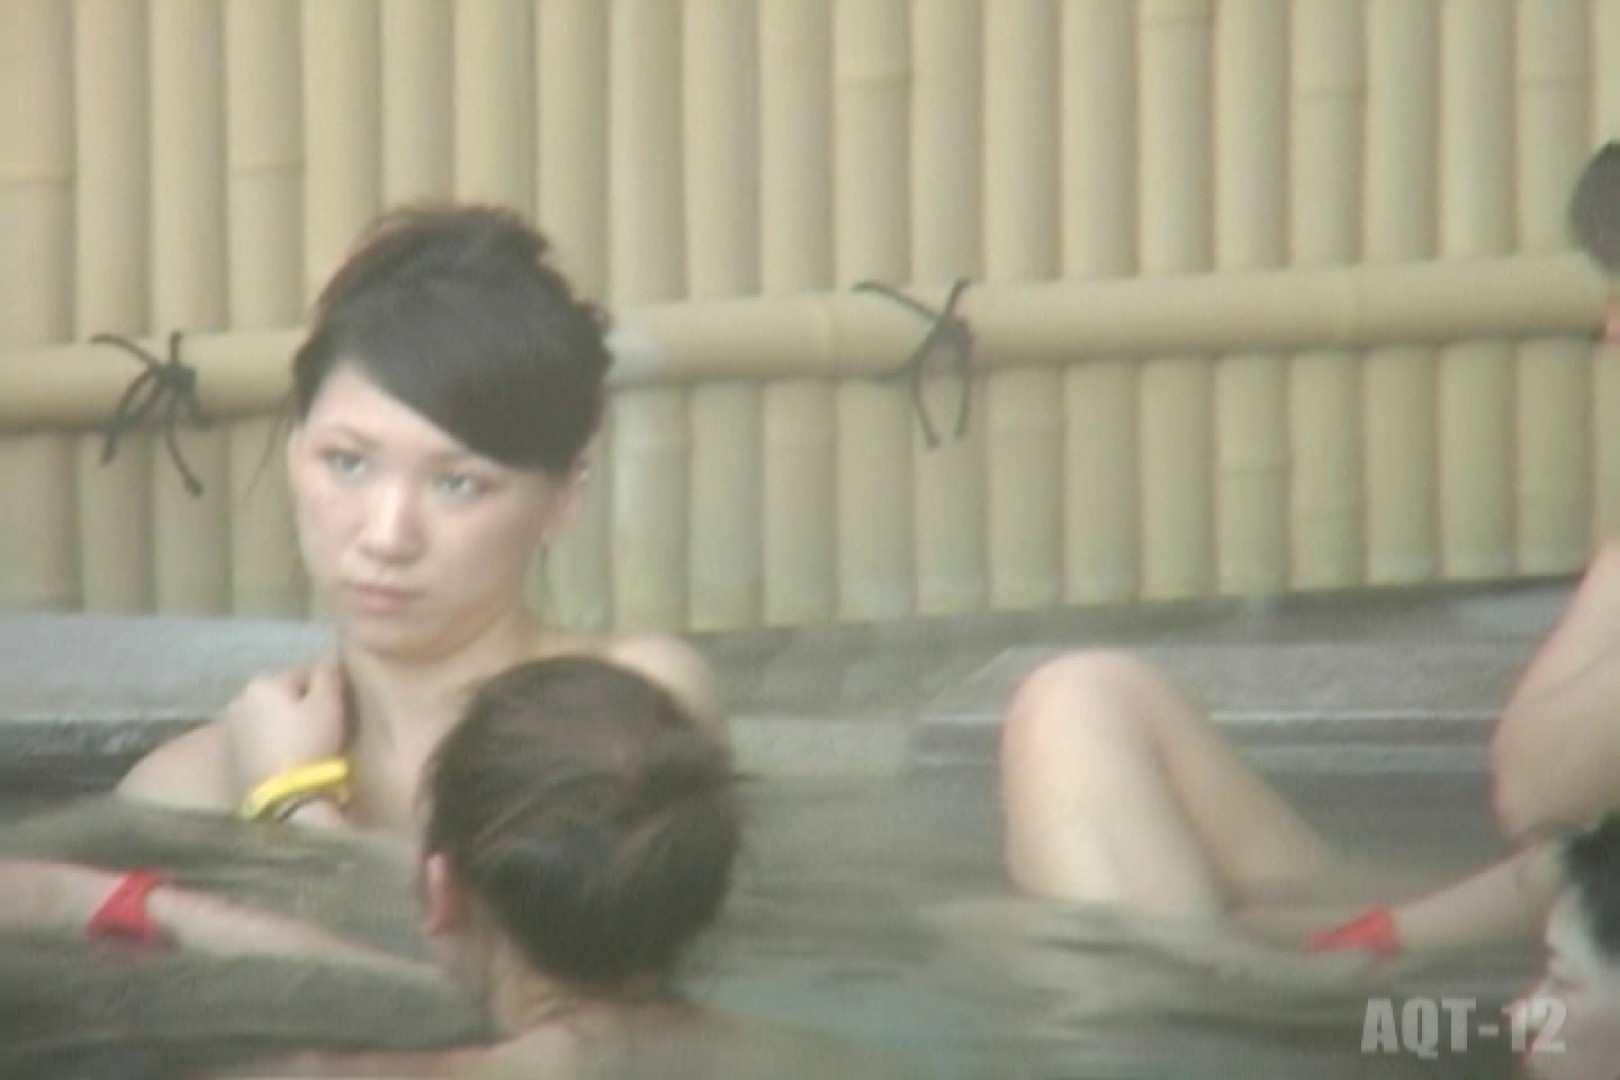 Aquaな露天風呂Vol.805 OL女体  53連発 39